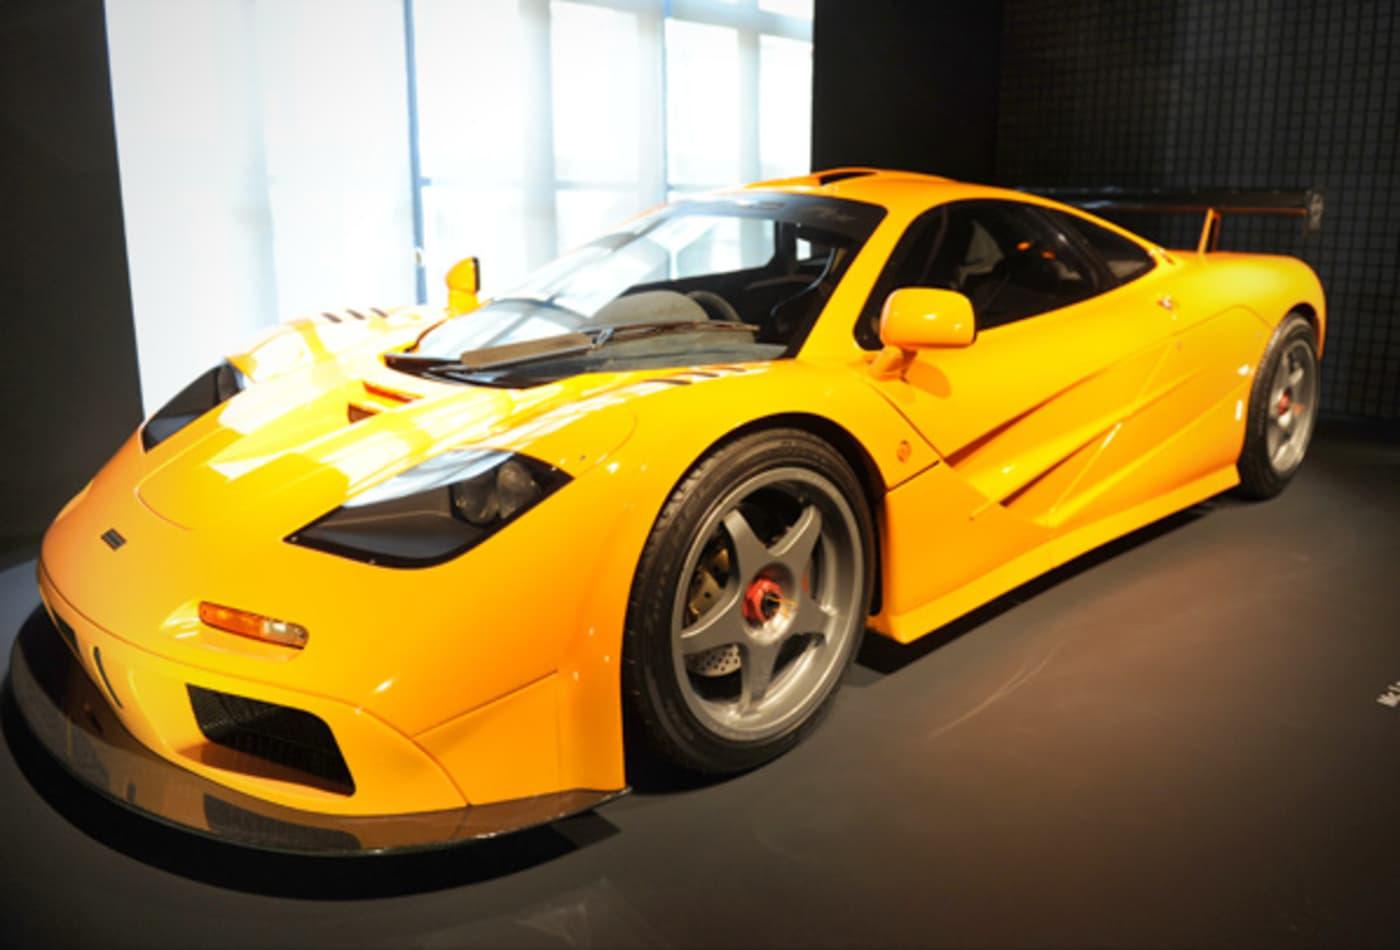 SS_Million_Dollar_Cars_McLaren_F1.jpg